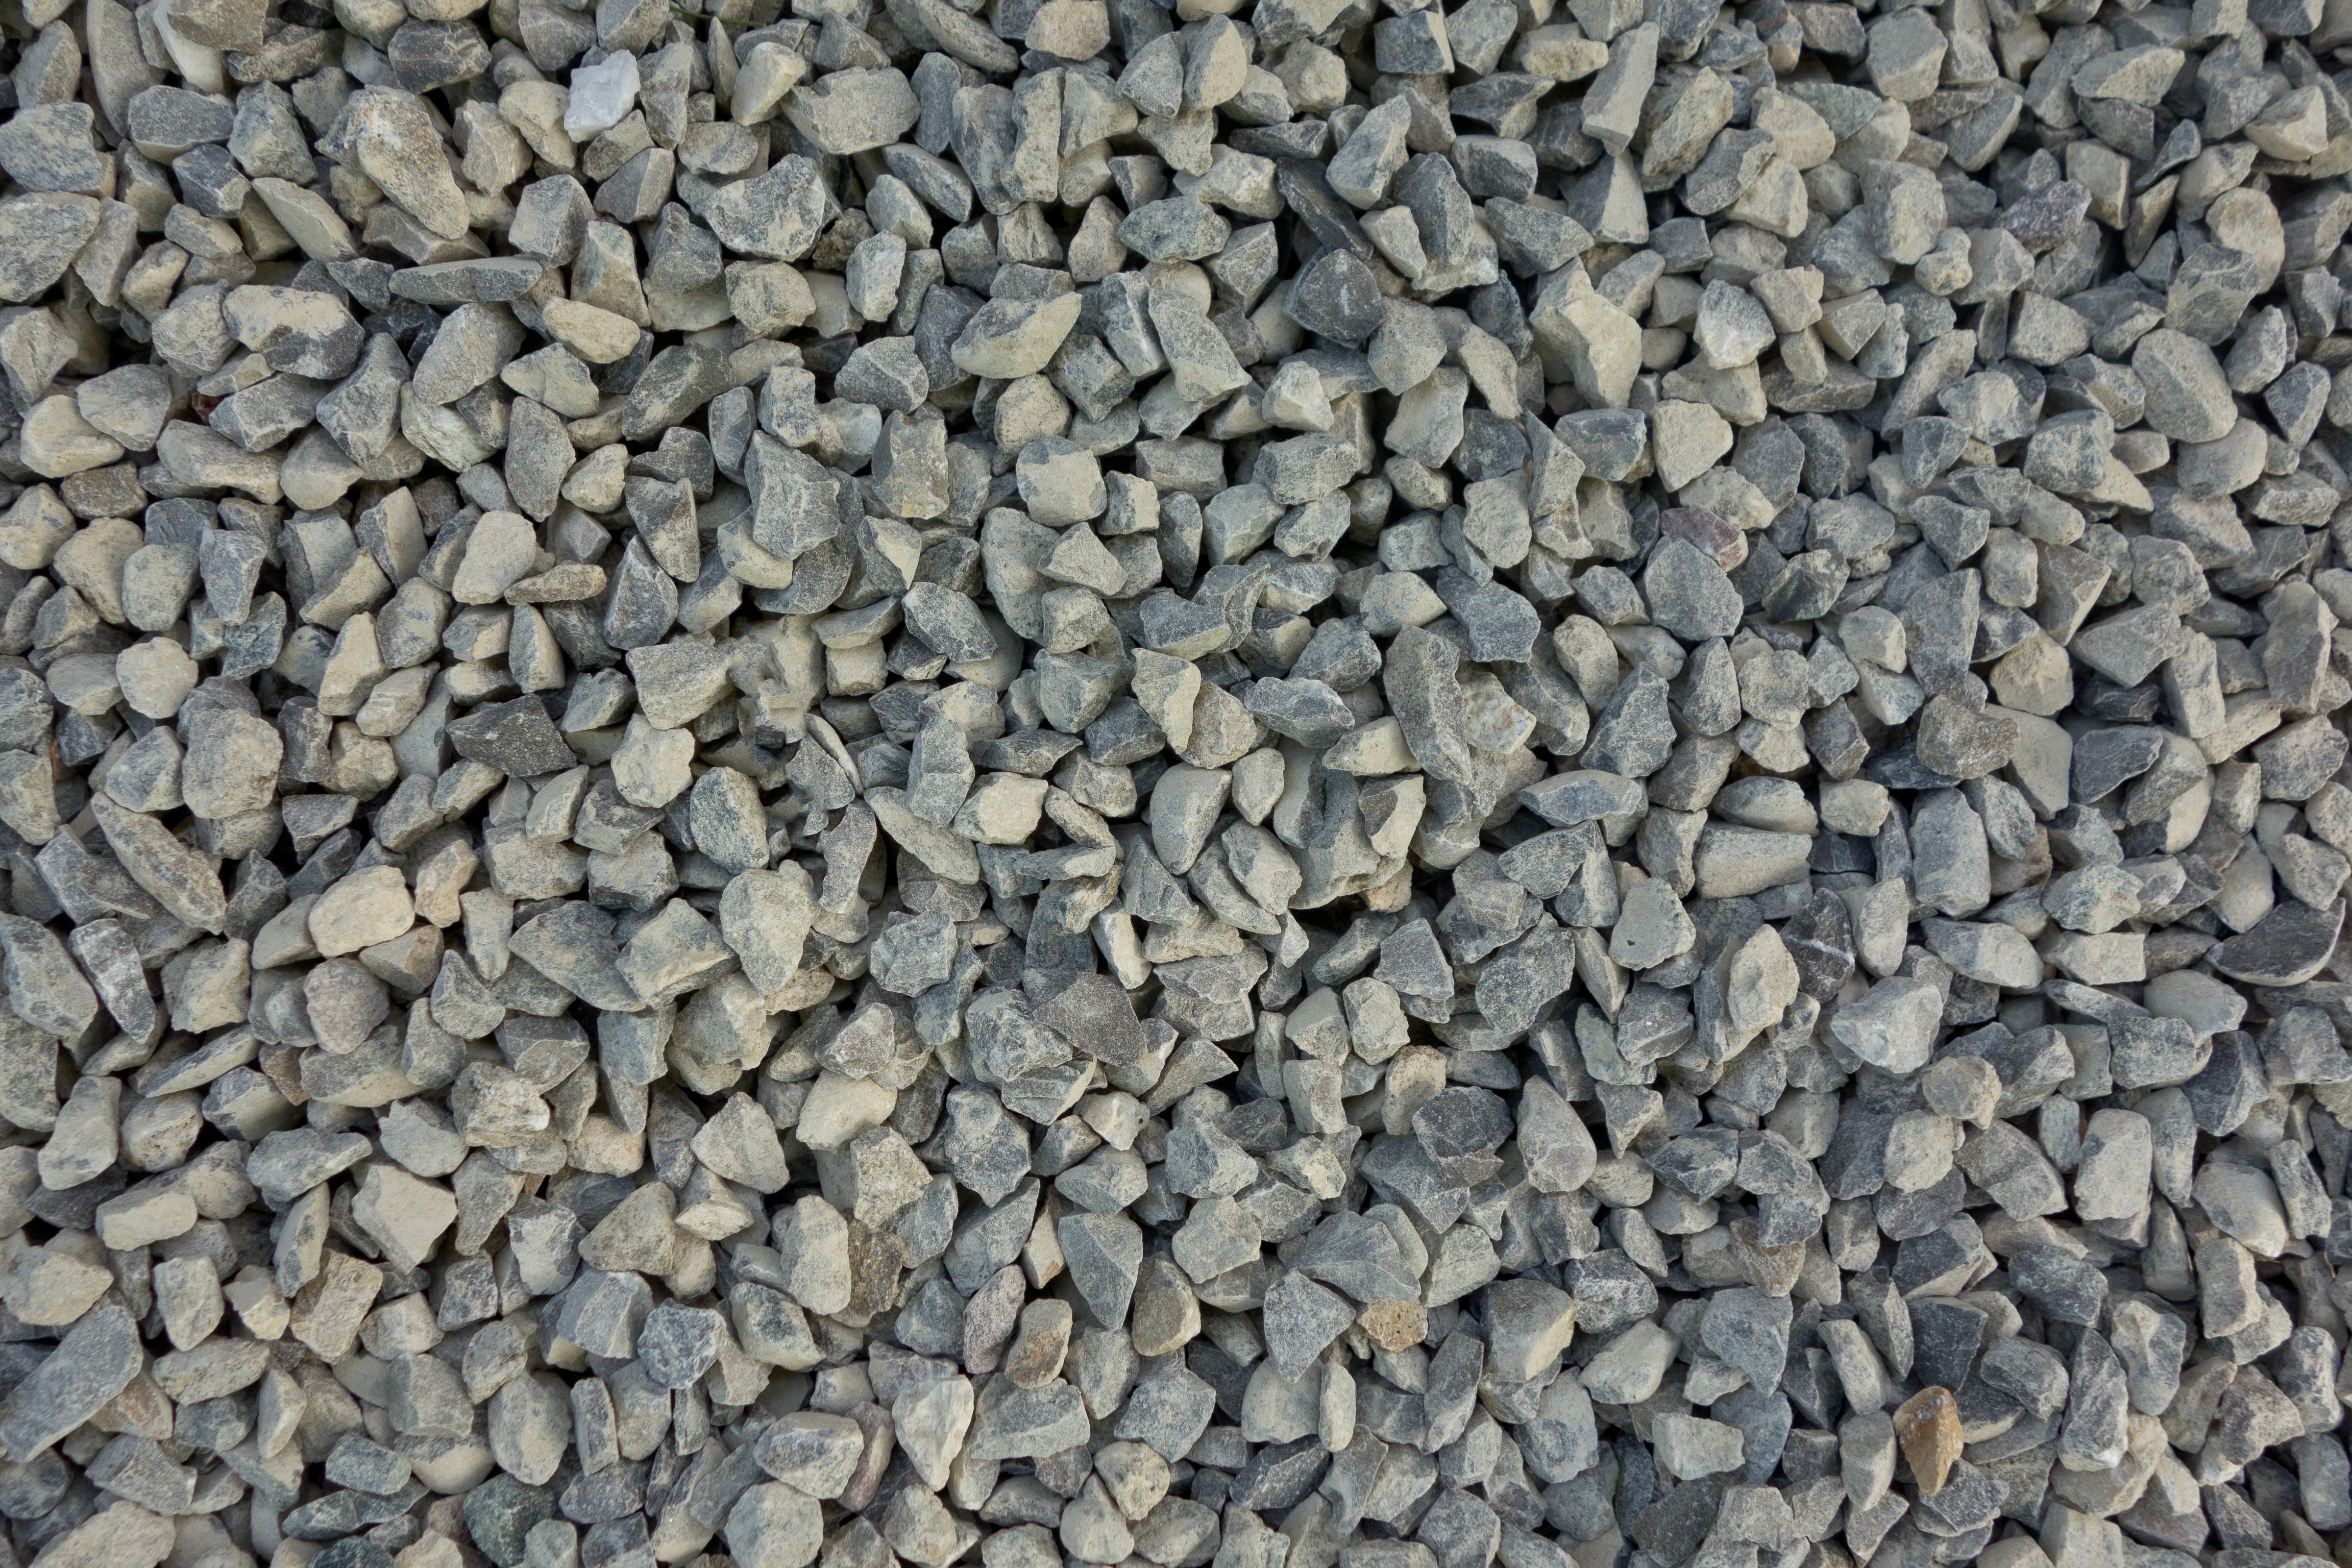 Kostenlose Foto Rock Struktur Boden Textur Asphalt Muster